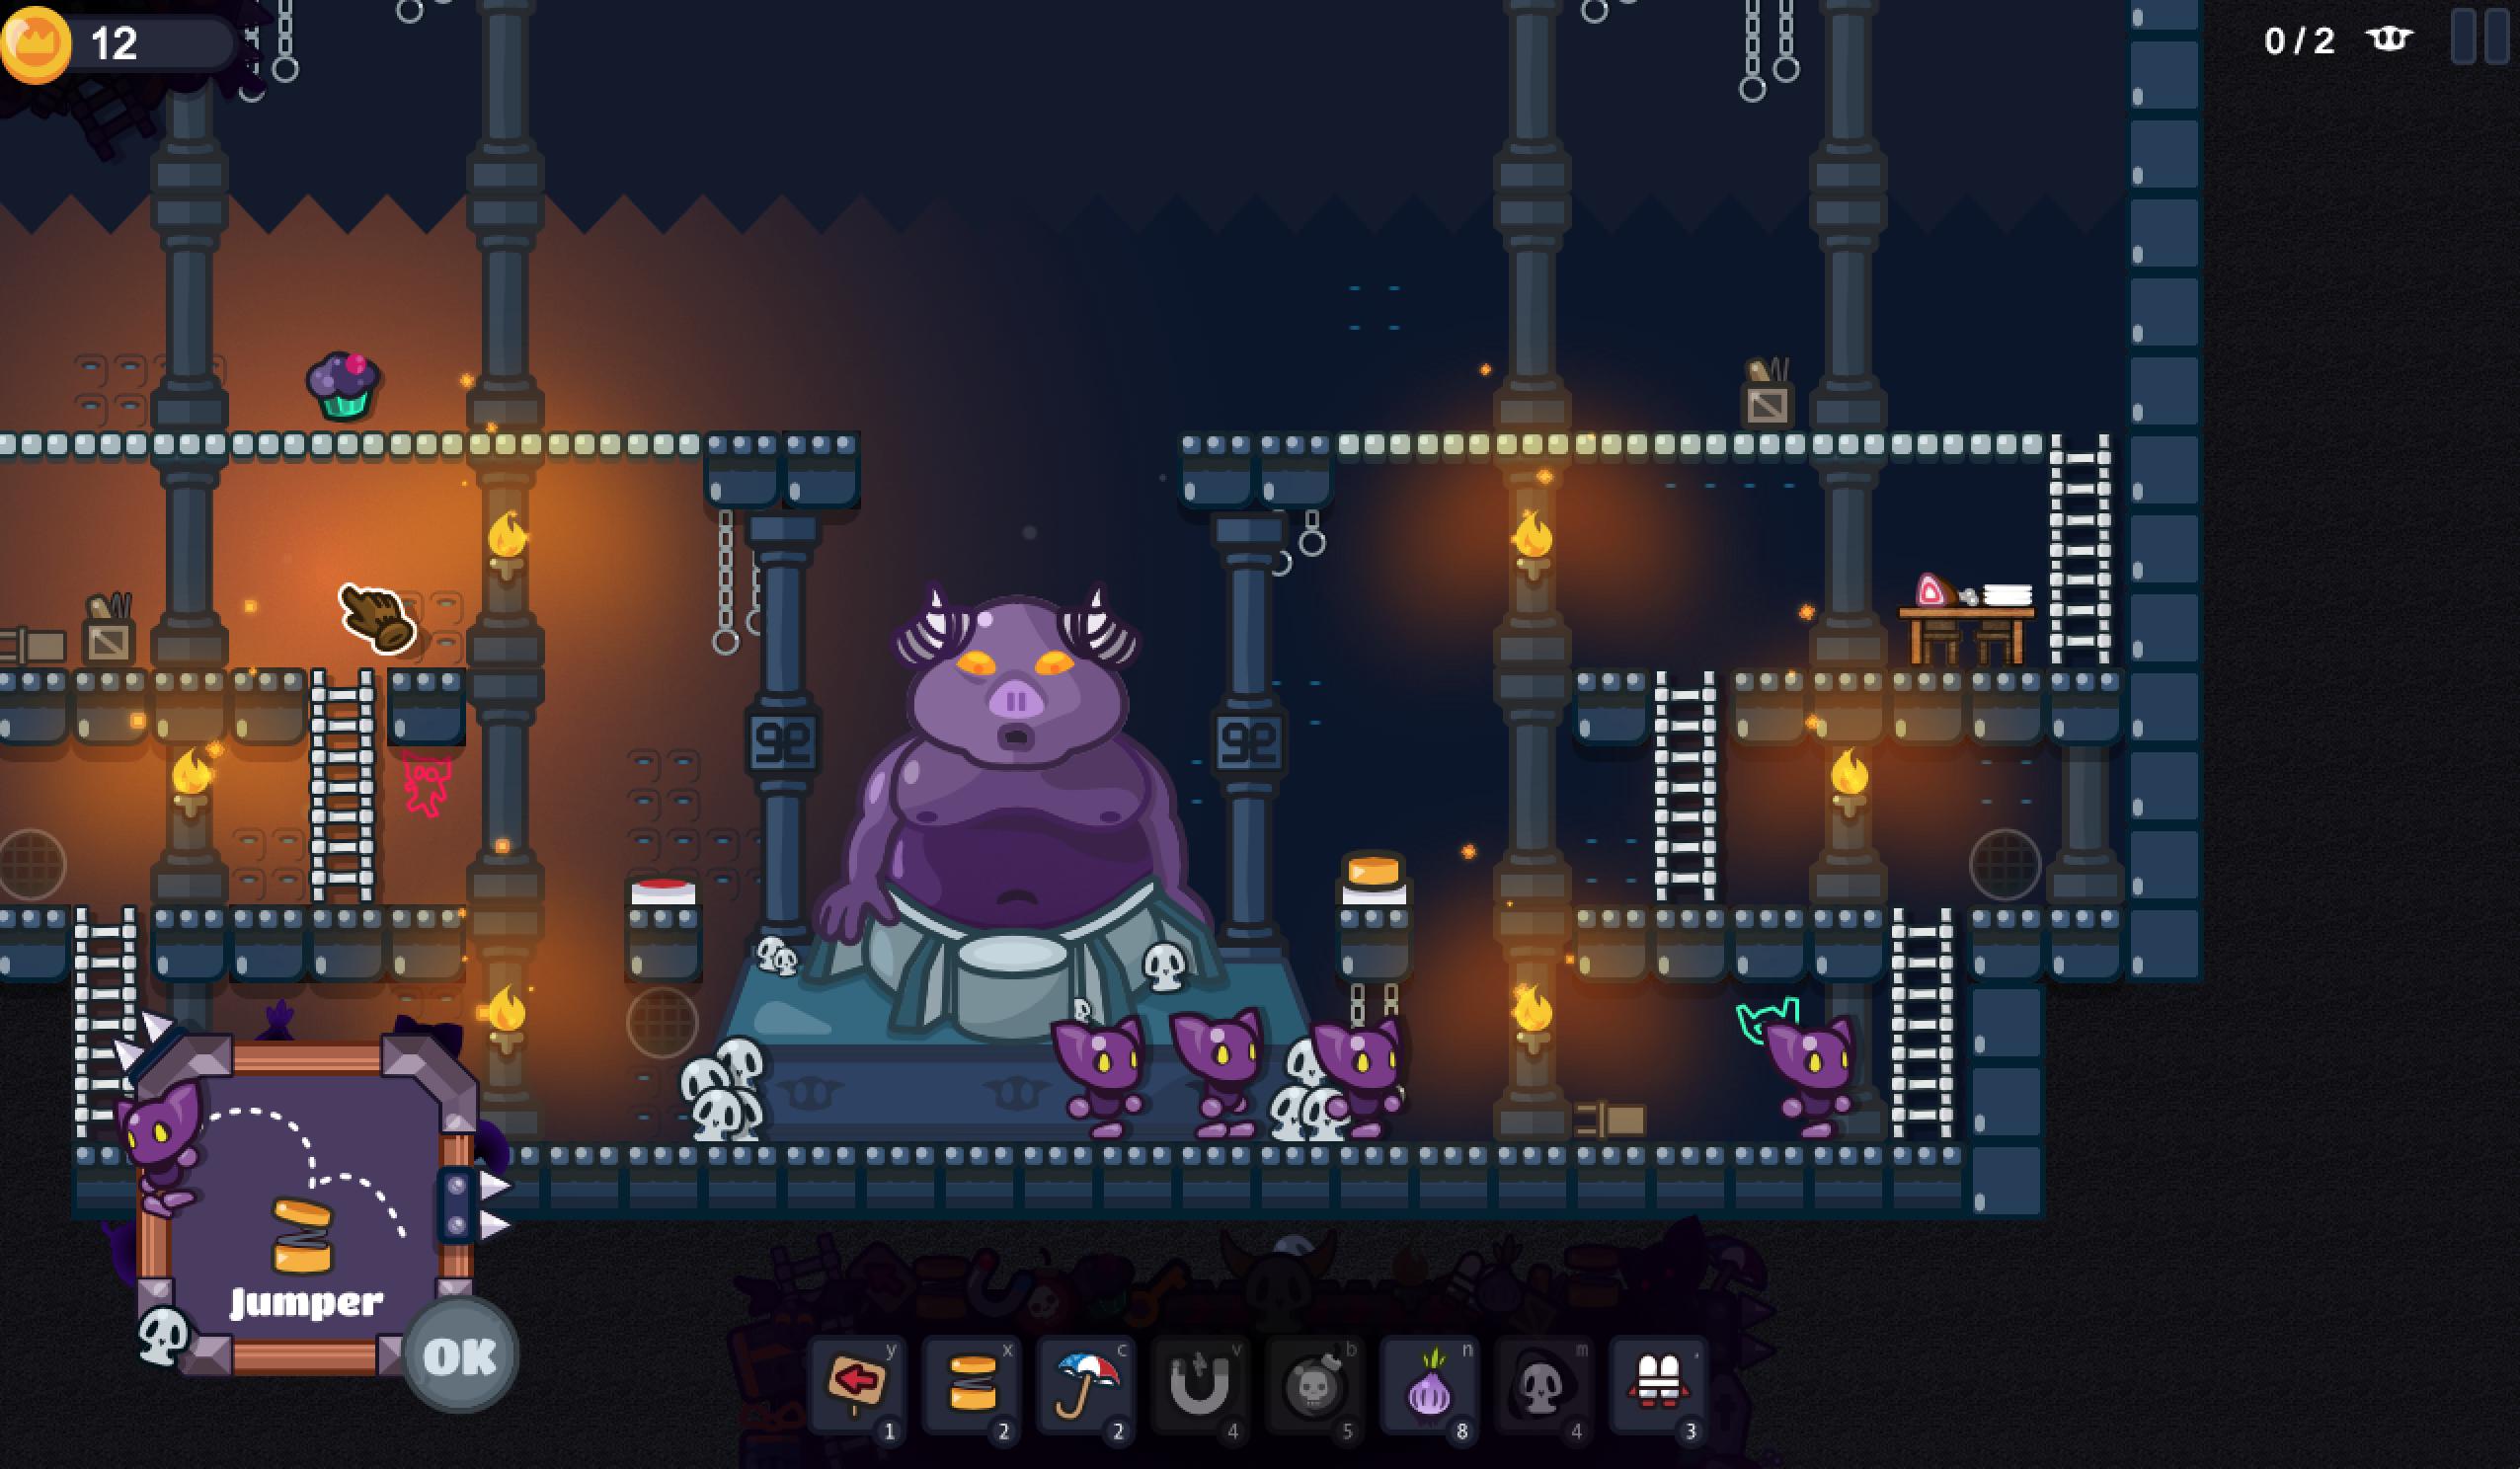 game ui item-frame